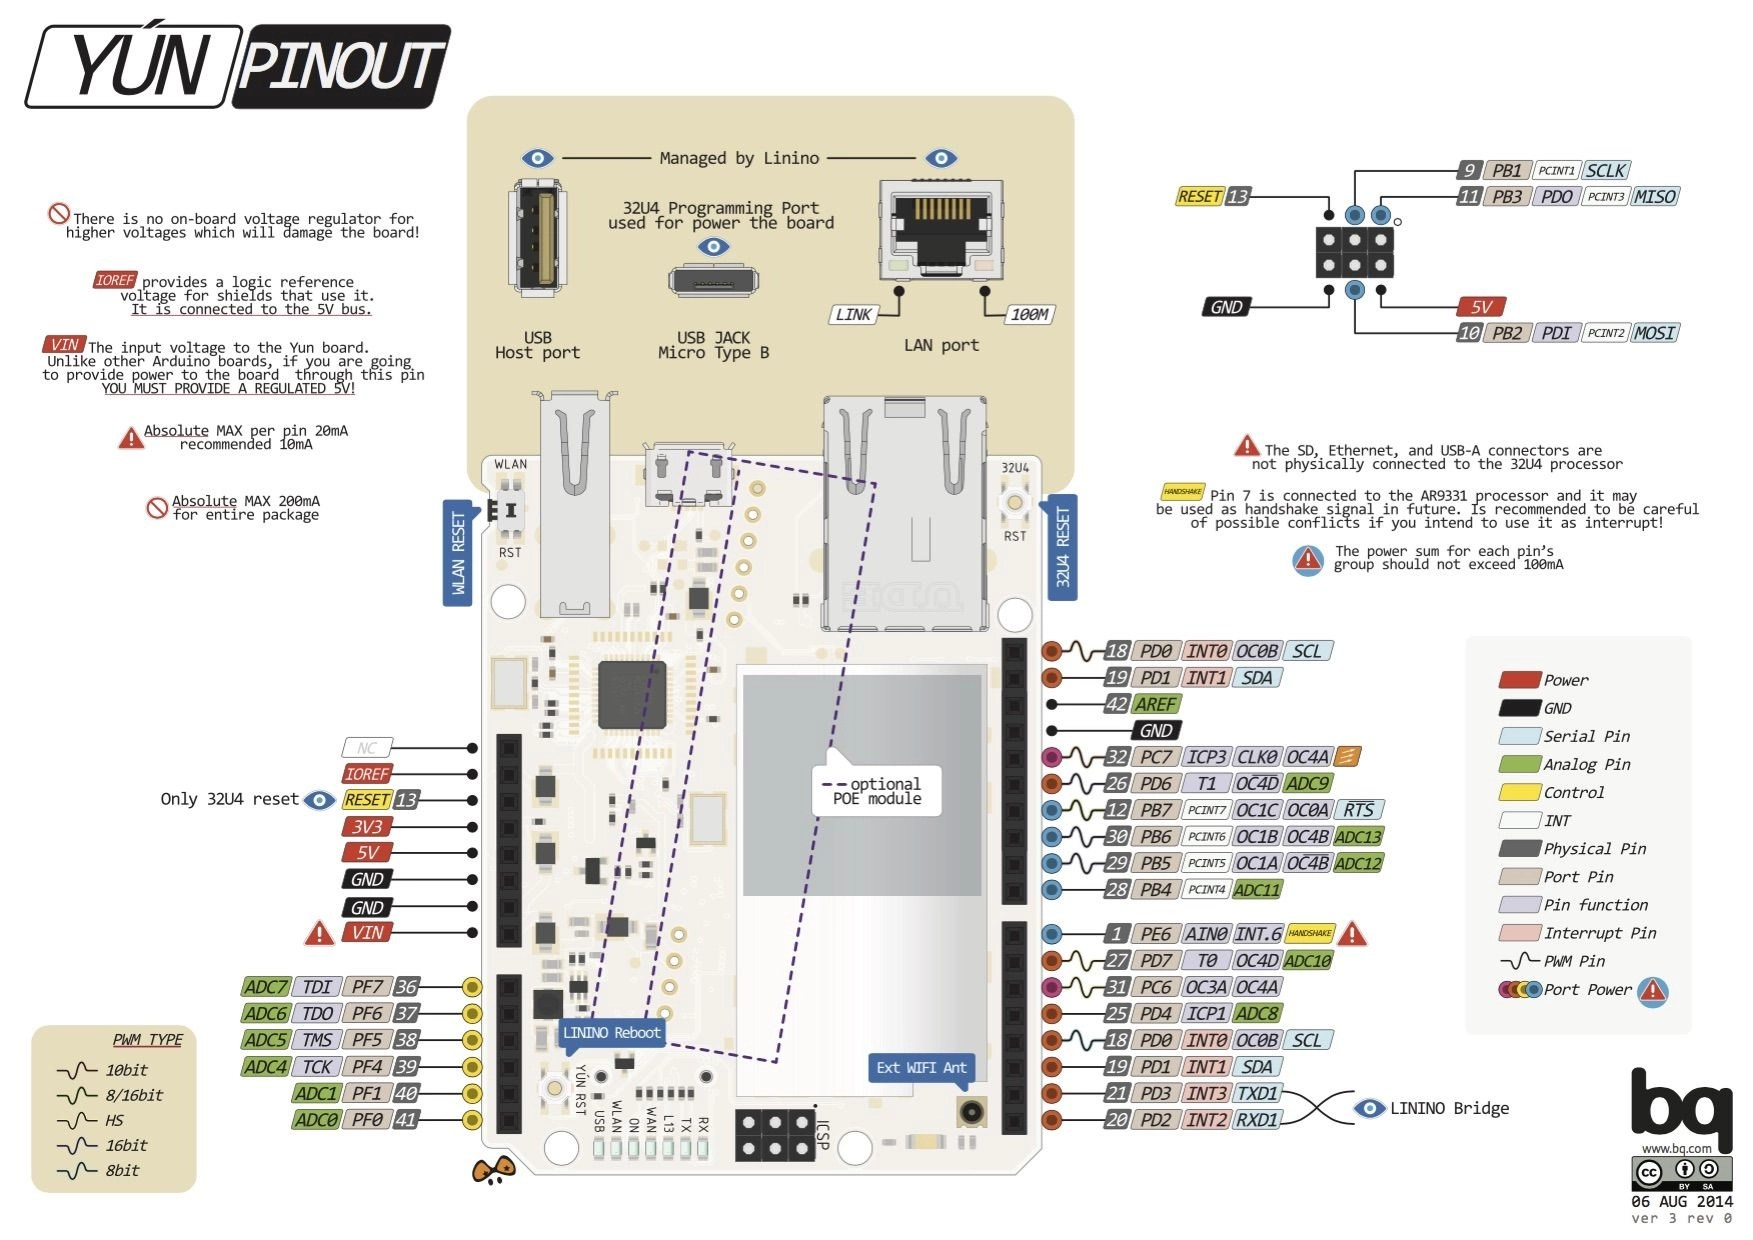 cat5 wiring diagram pdf 2002 dodge neon diagrama de pines arduino pinout geek factory